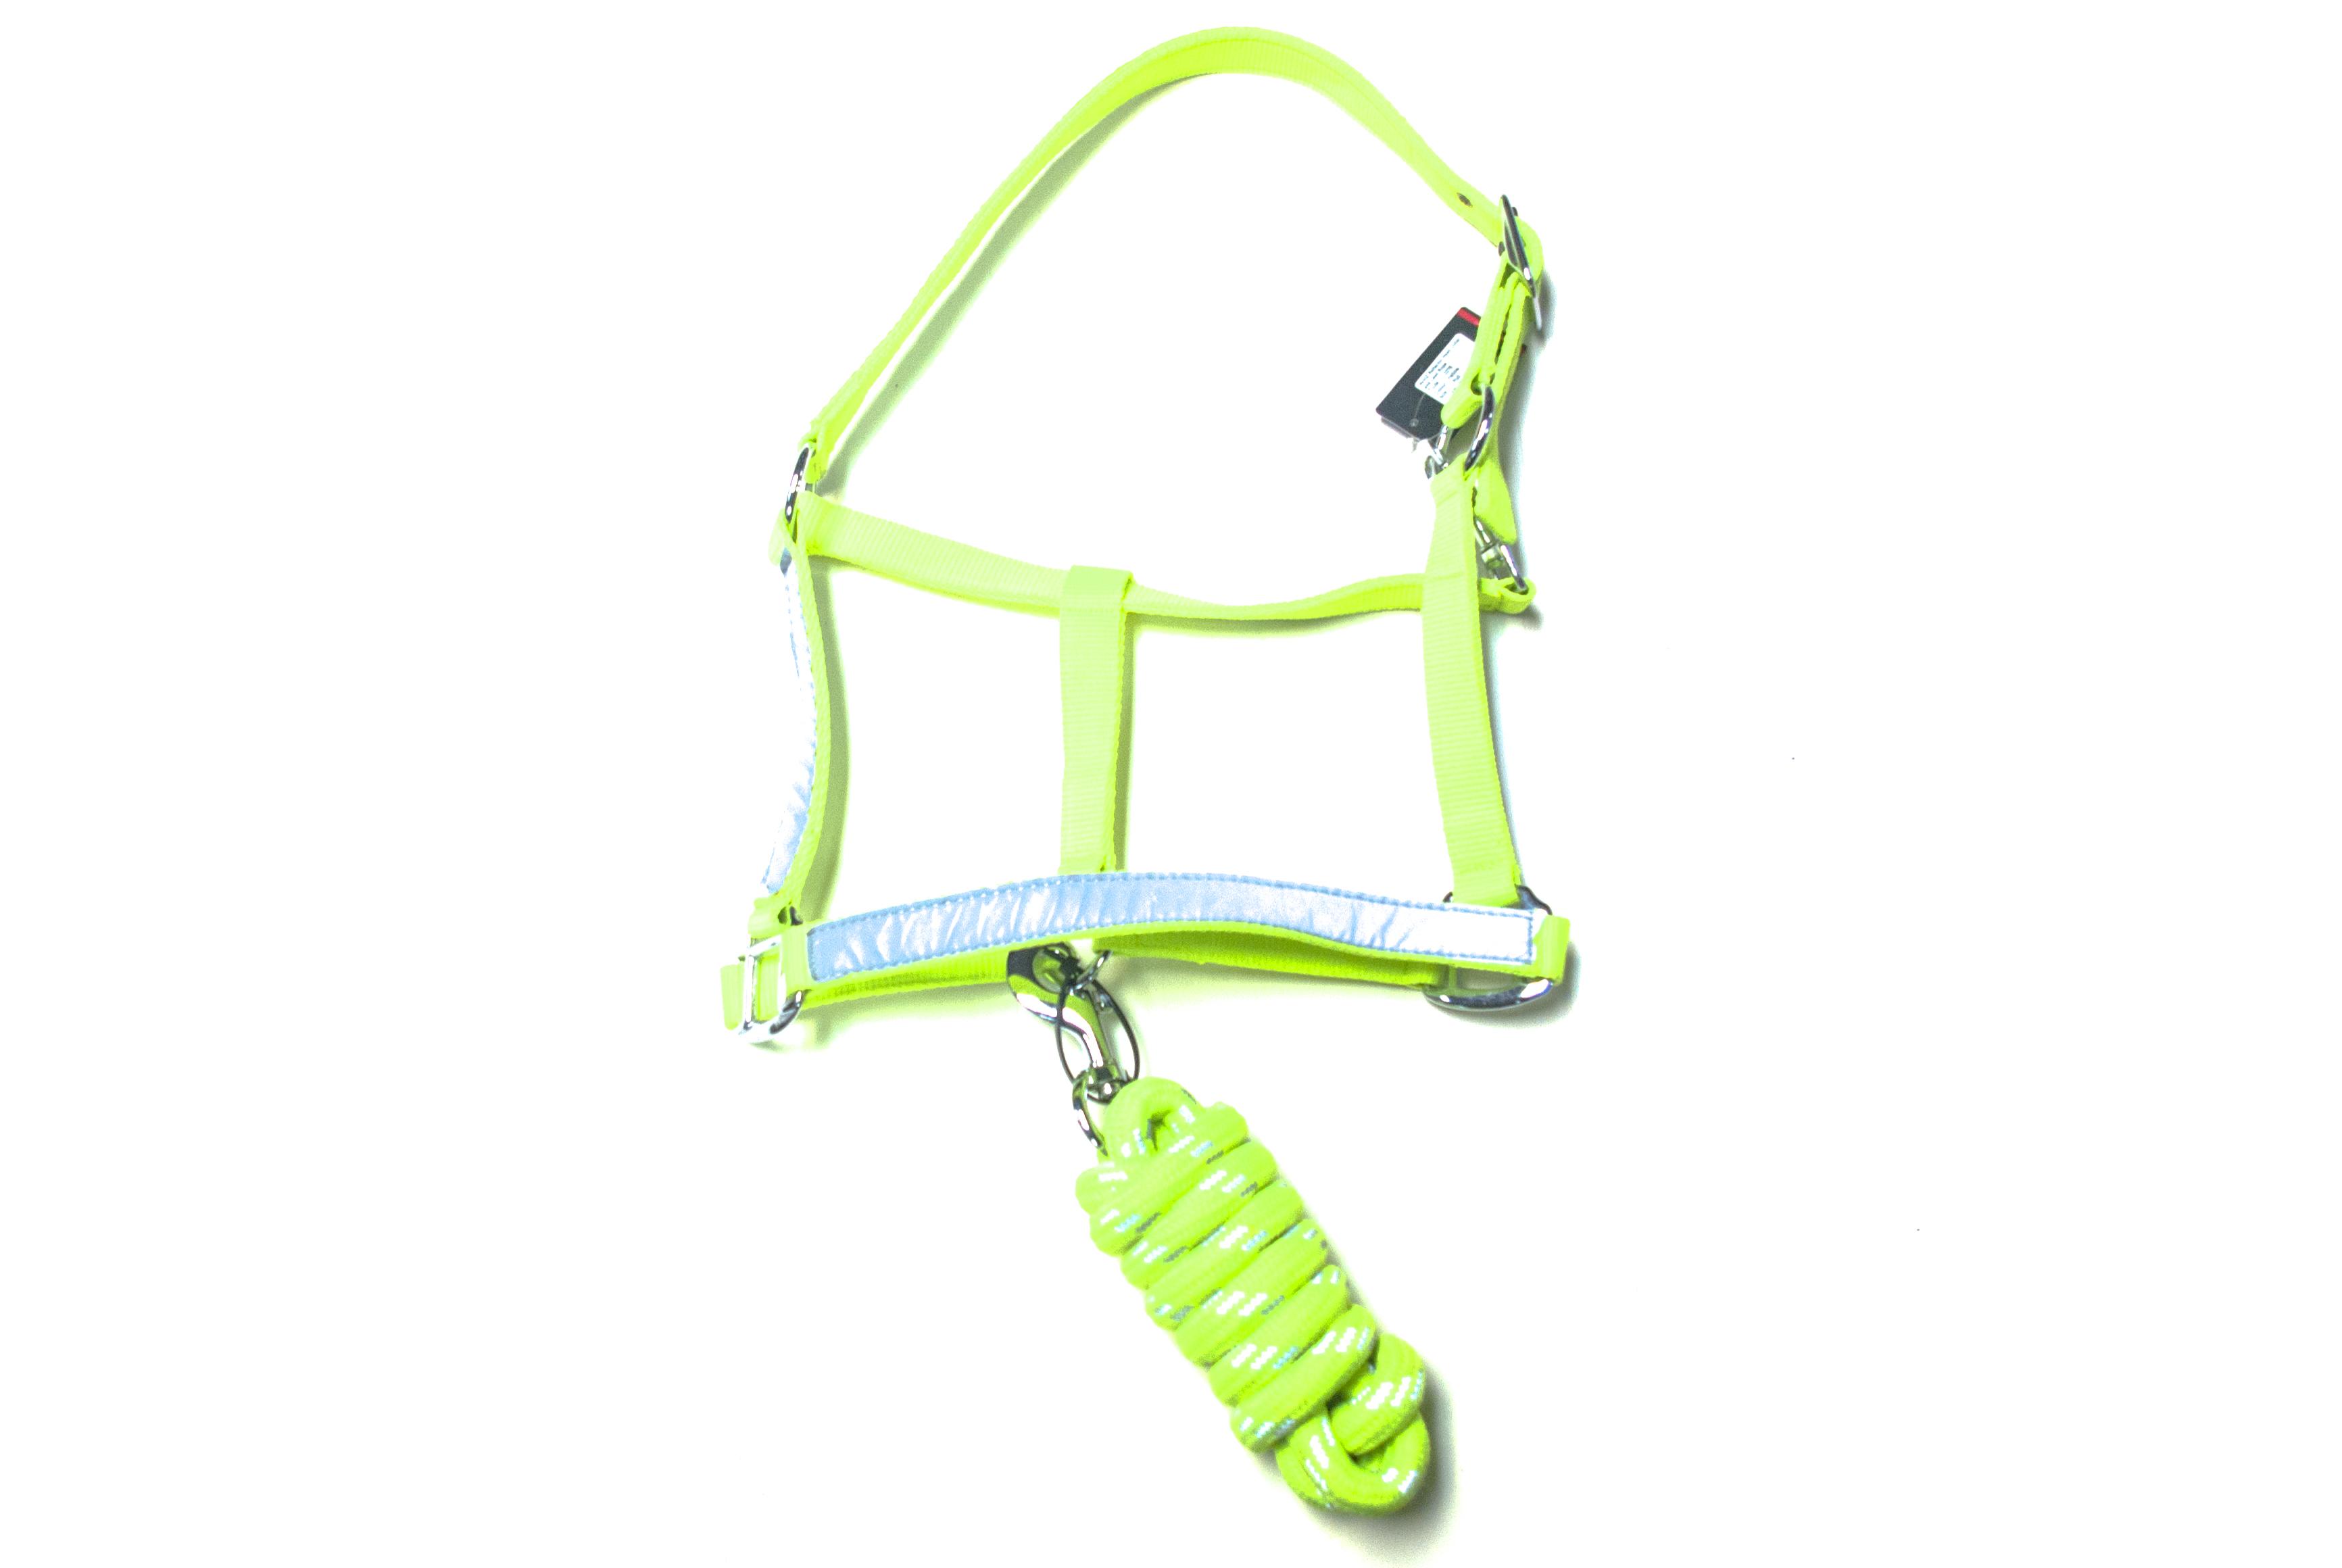 Hy Hi Vis headcollar and lead rope set